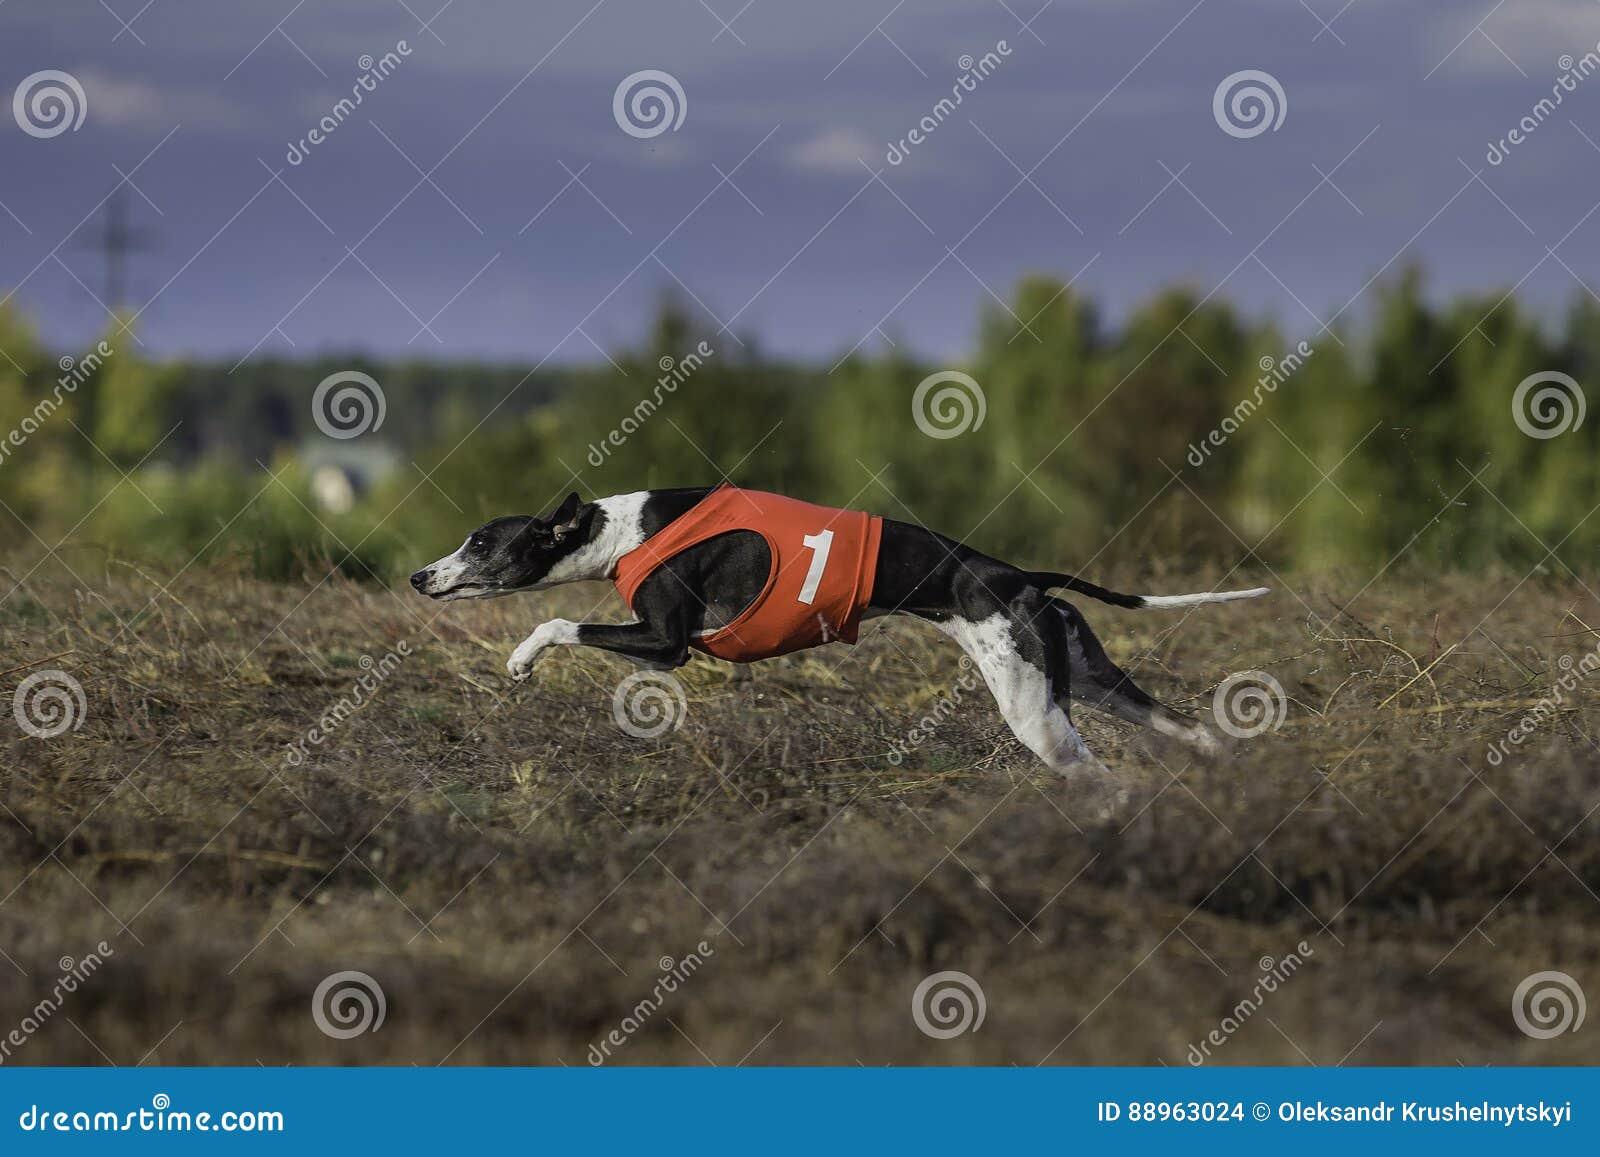 Whippet狗赛跑 追猎,激情和速度